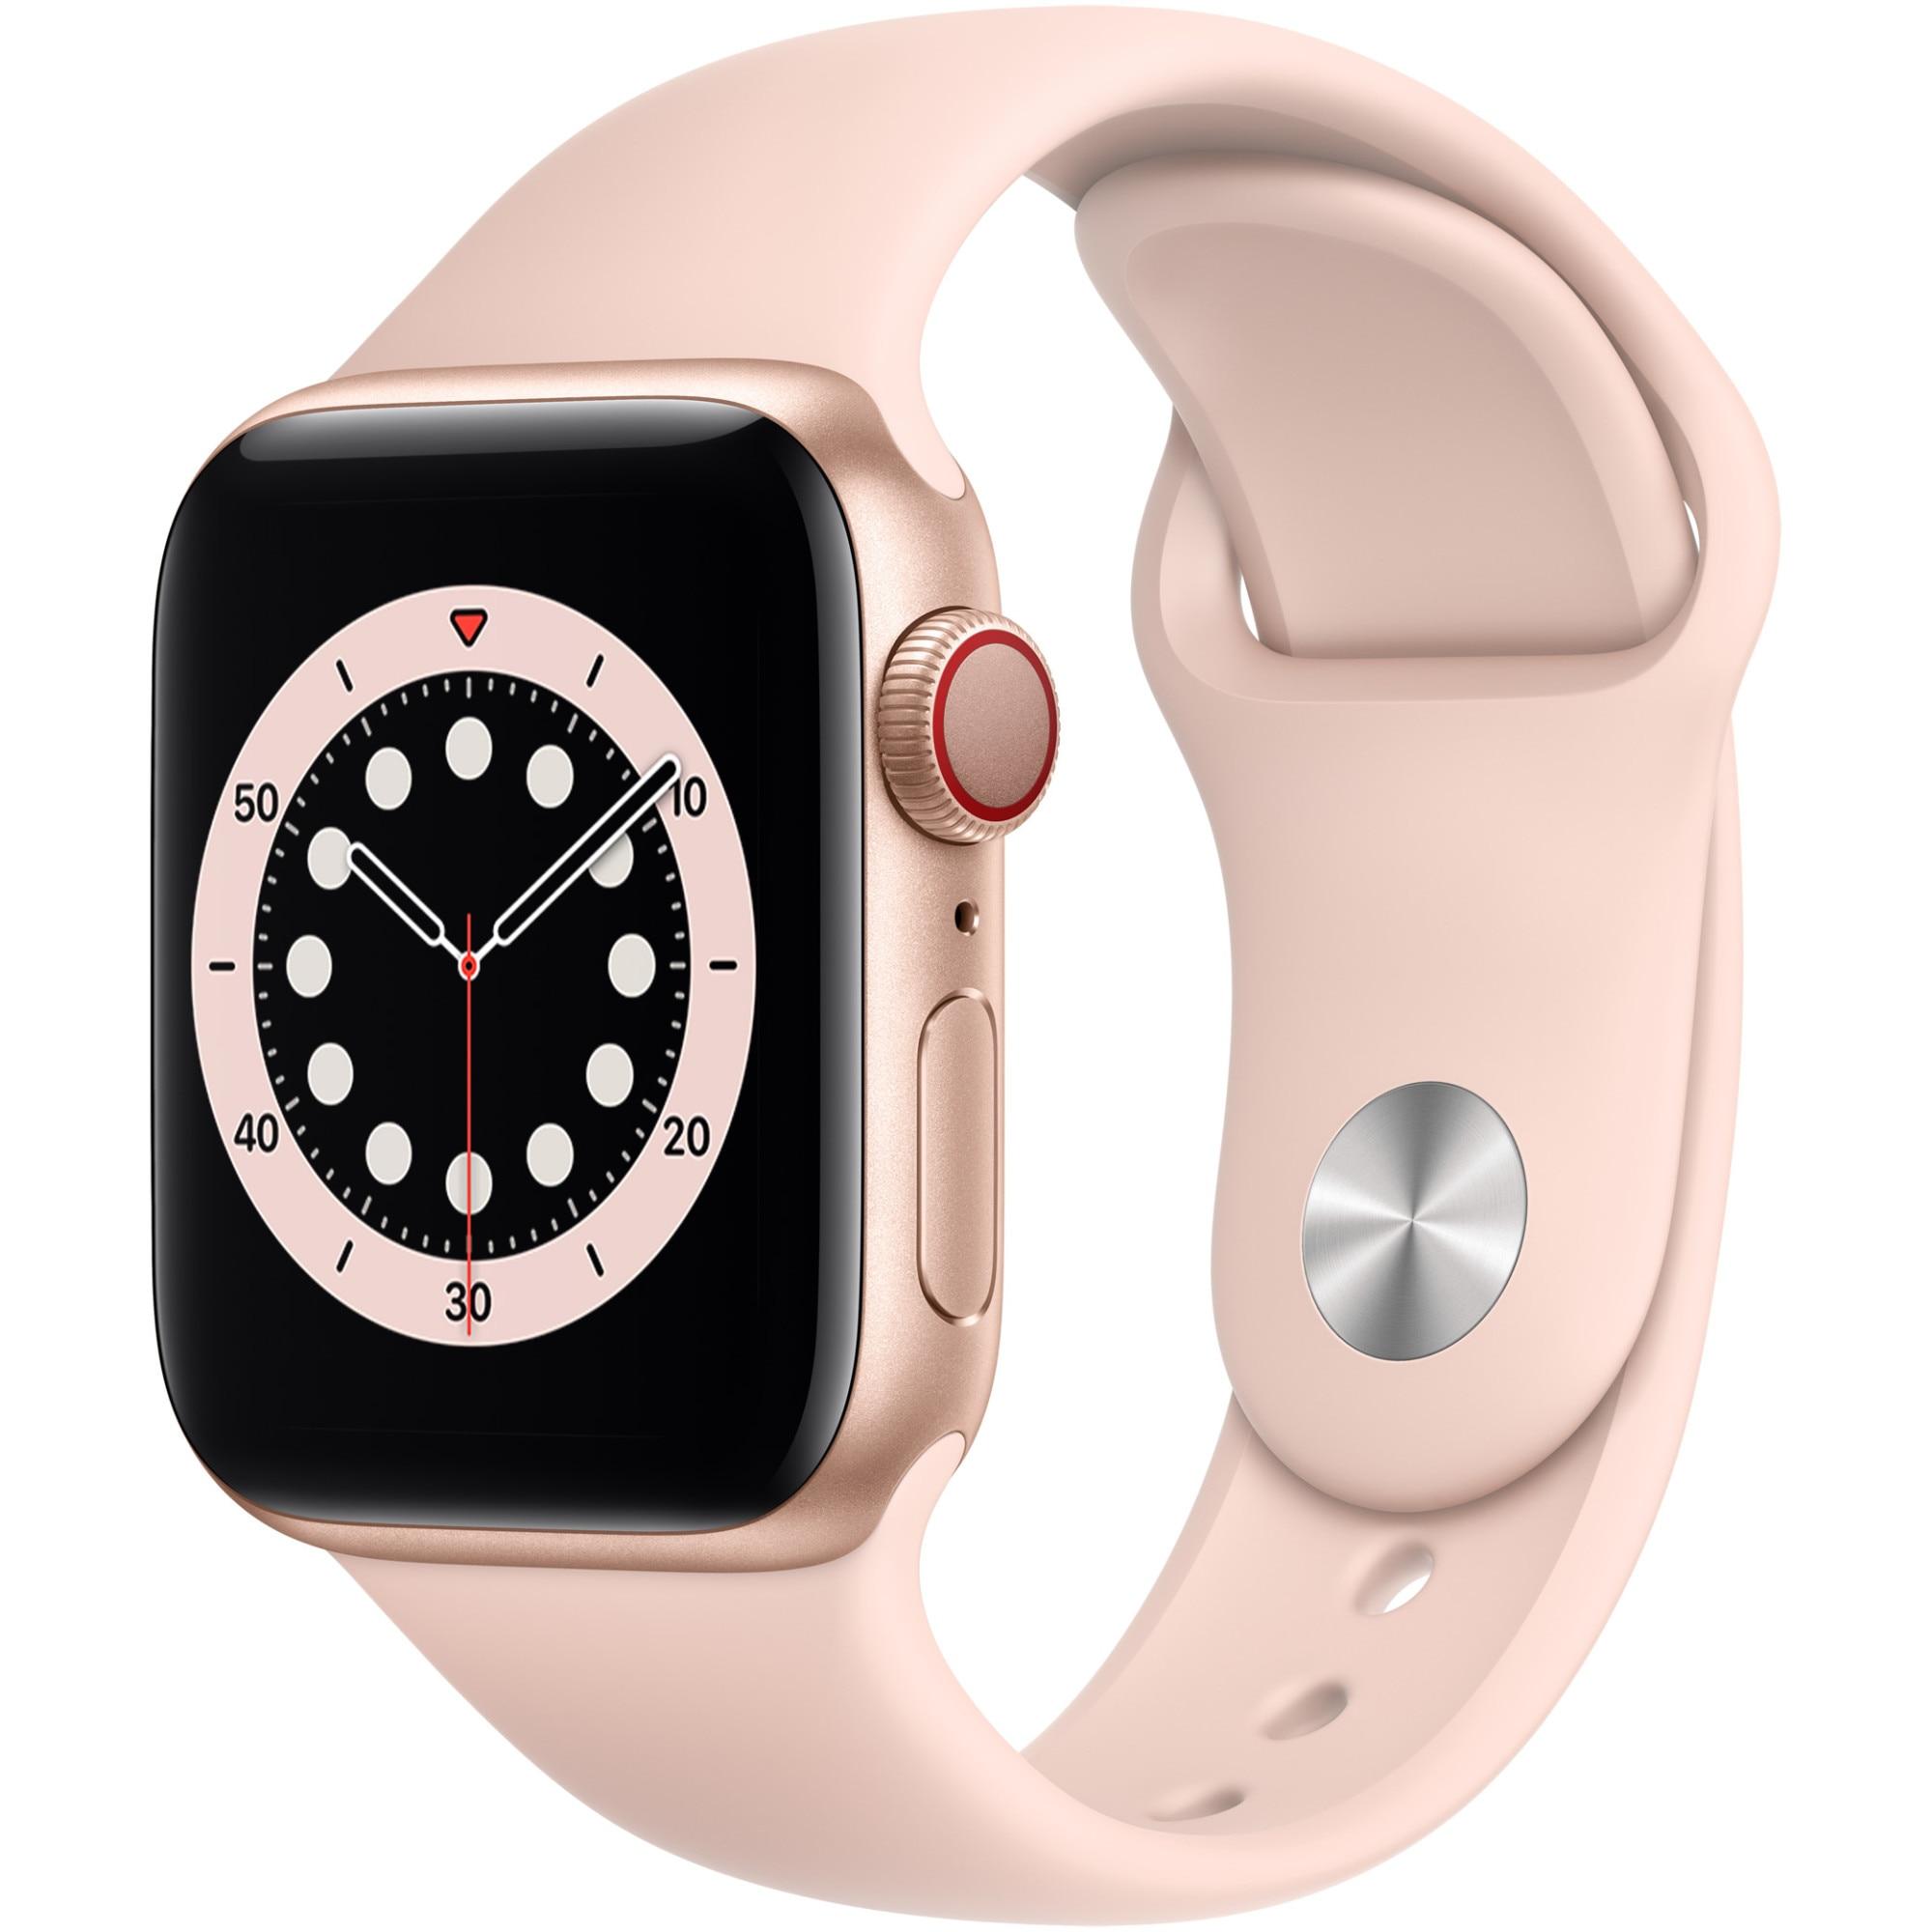 Fotografie Apple Watch 6, GPS, Cellular, Carcasa Gold Aluminium 40mm, Pink Sand Sport Band